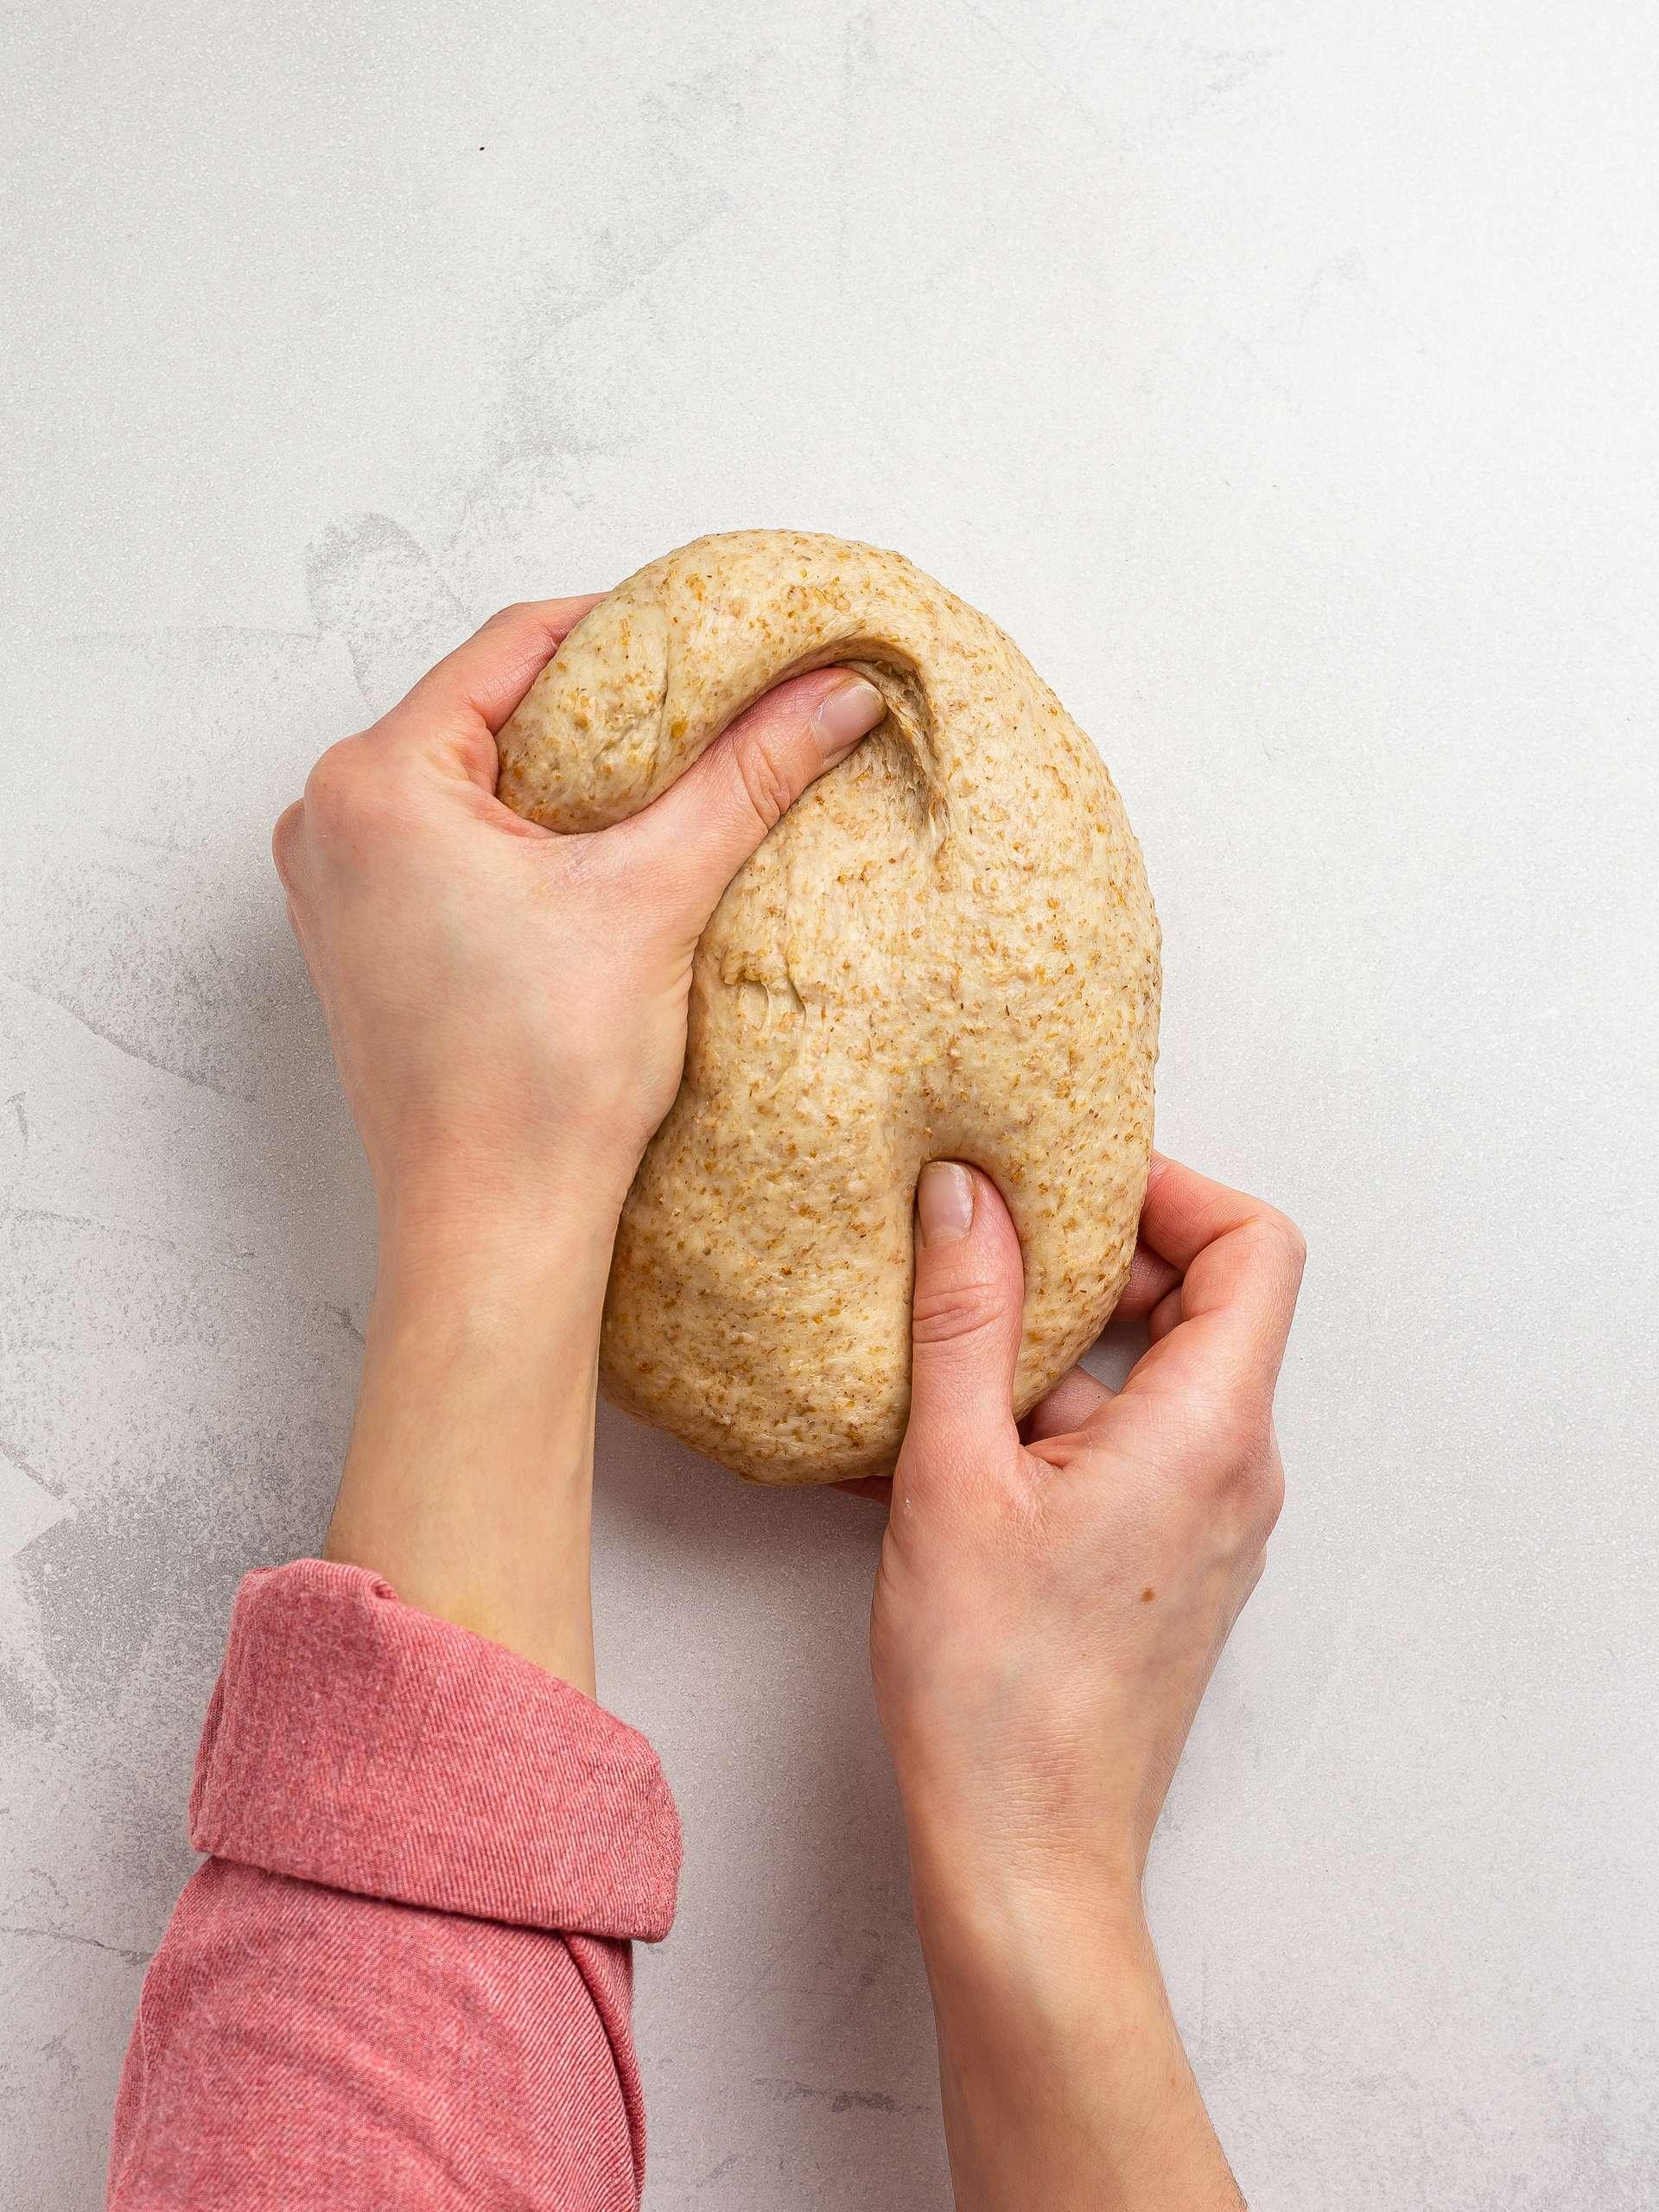 kneading krantz cake dough